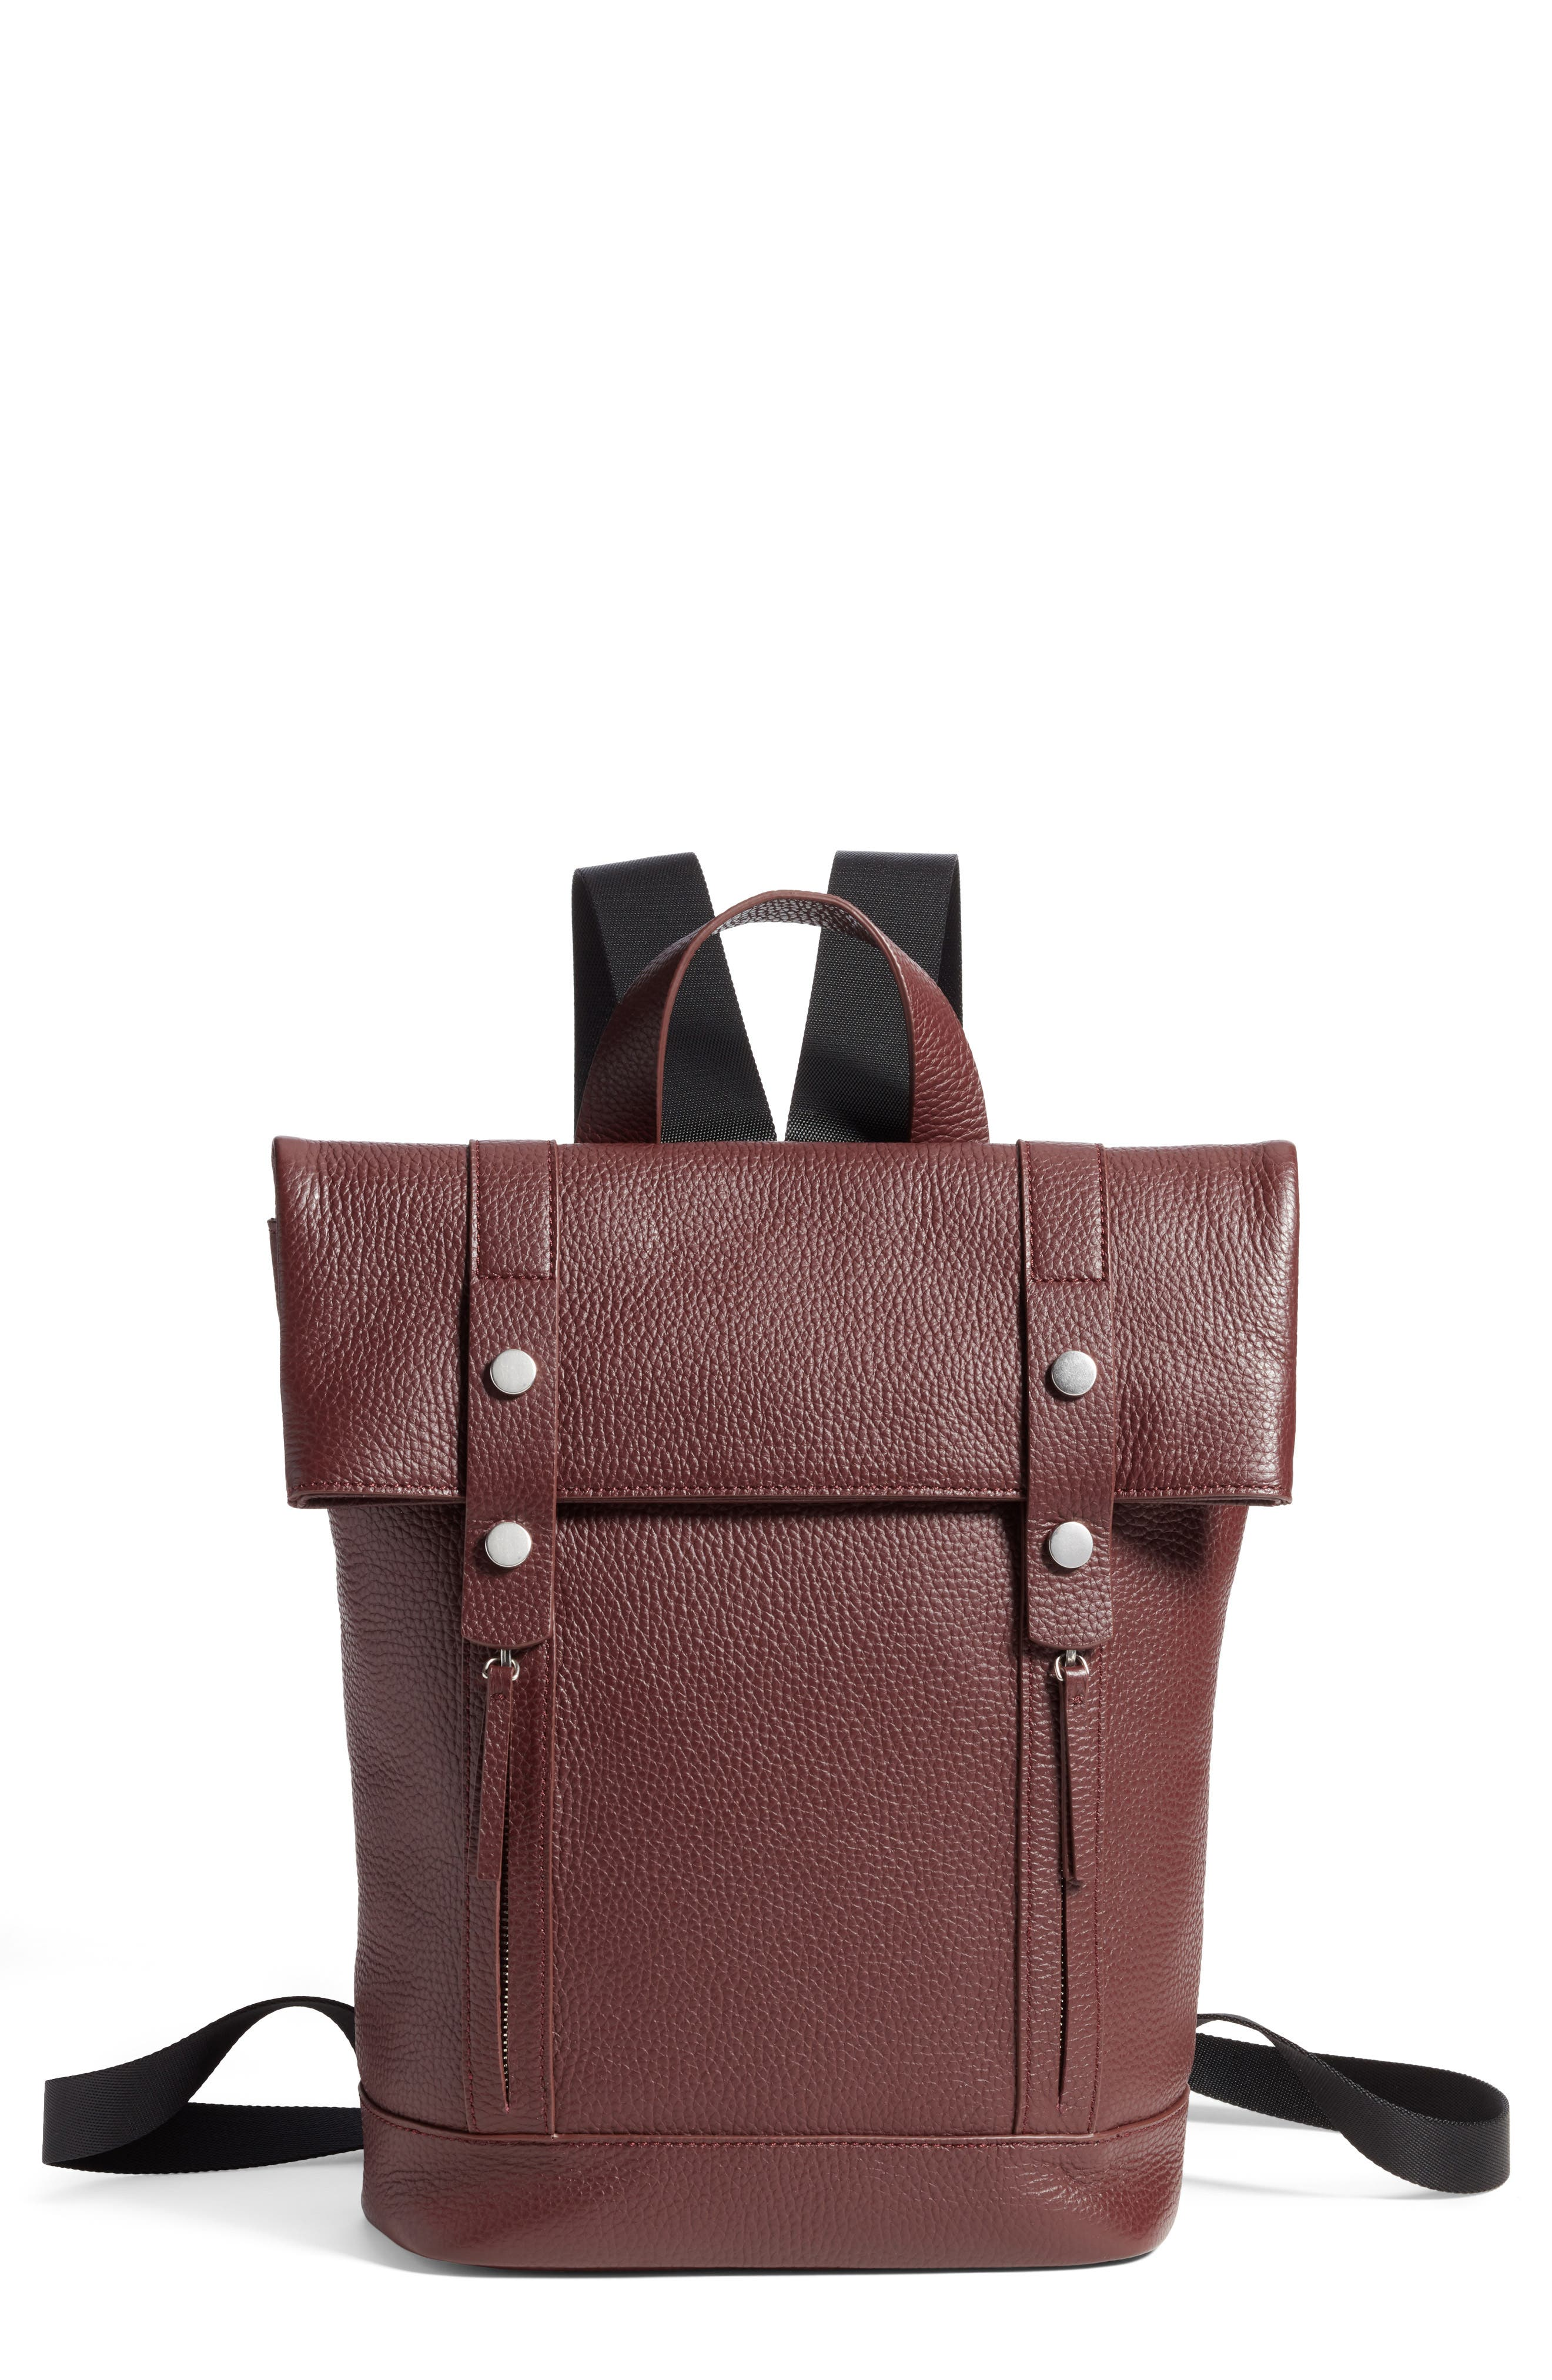 Remy Pebbled Leather Backpack,                         Main,                         color, BURGUNDY FIG